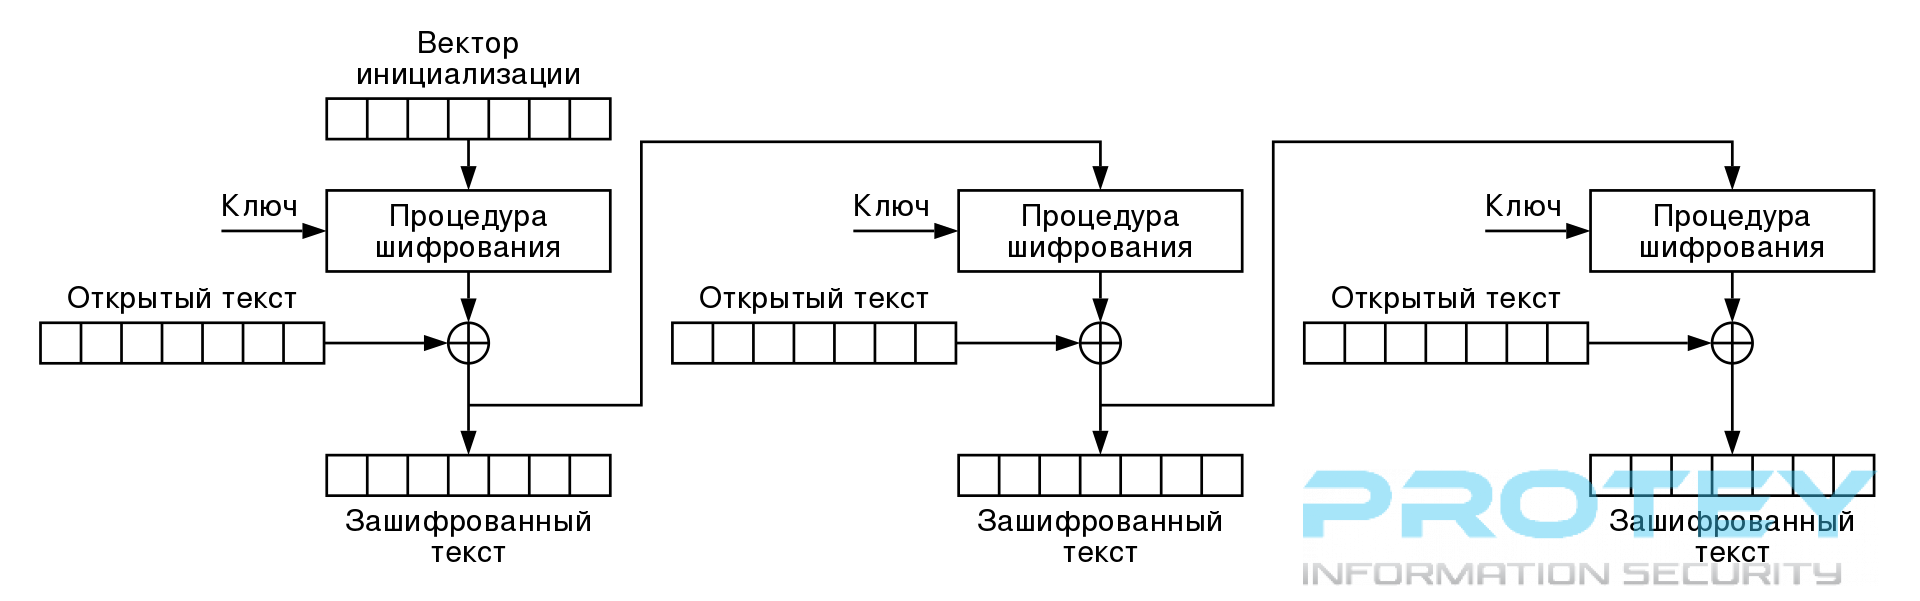 1920px-CFB_Encryption_ru.svg.png